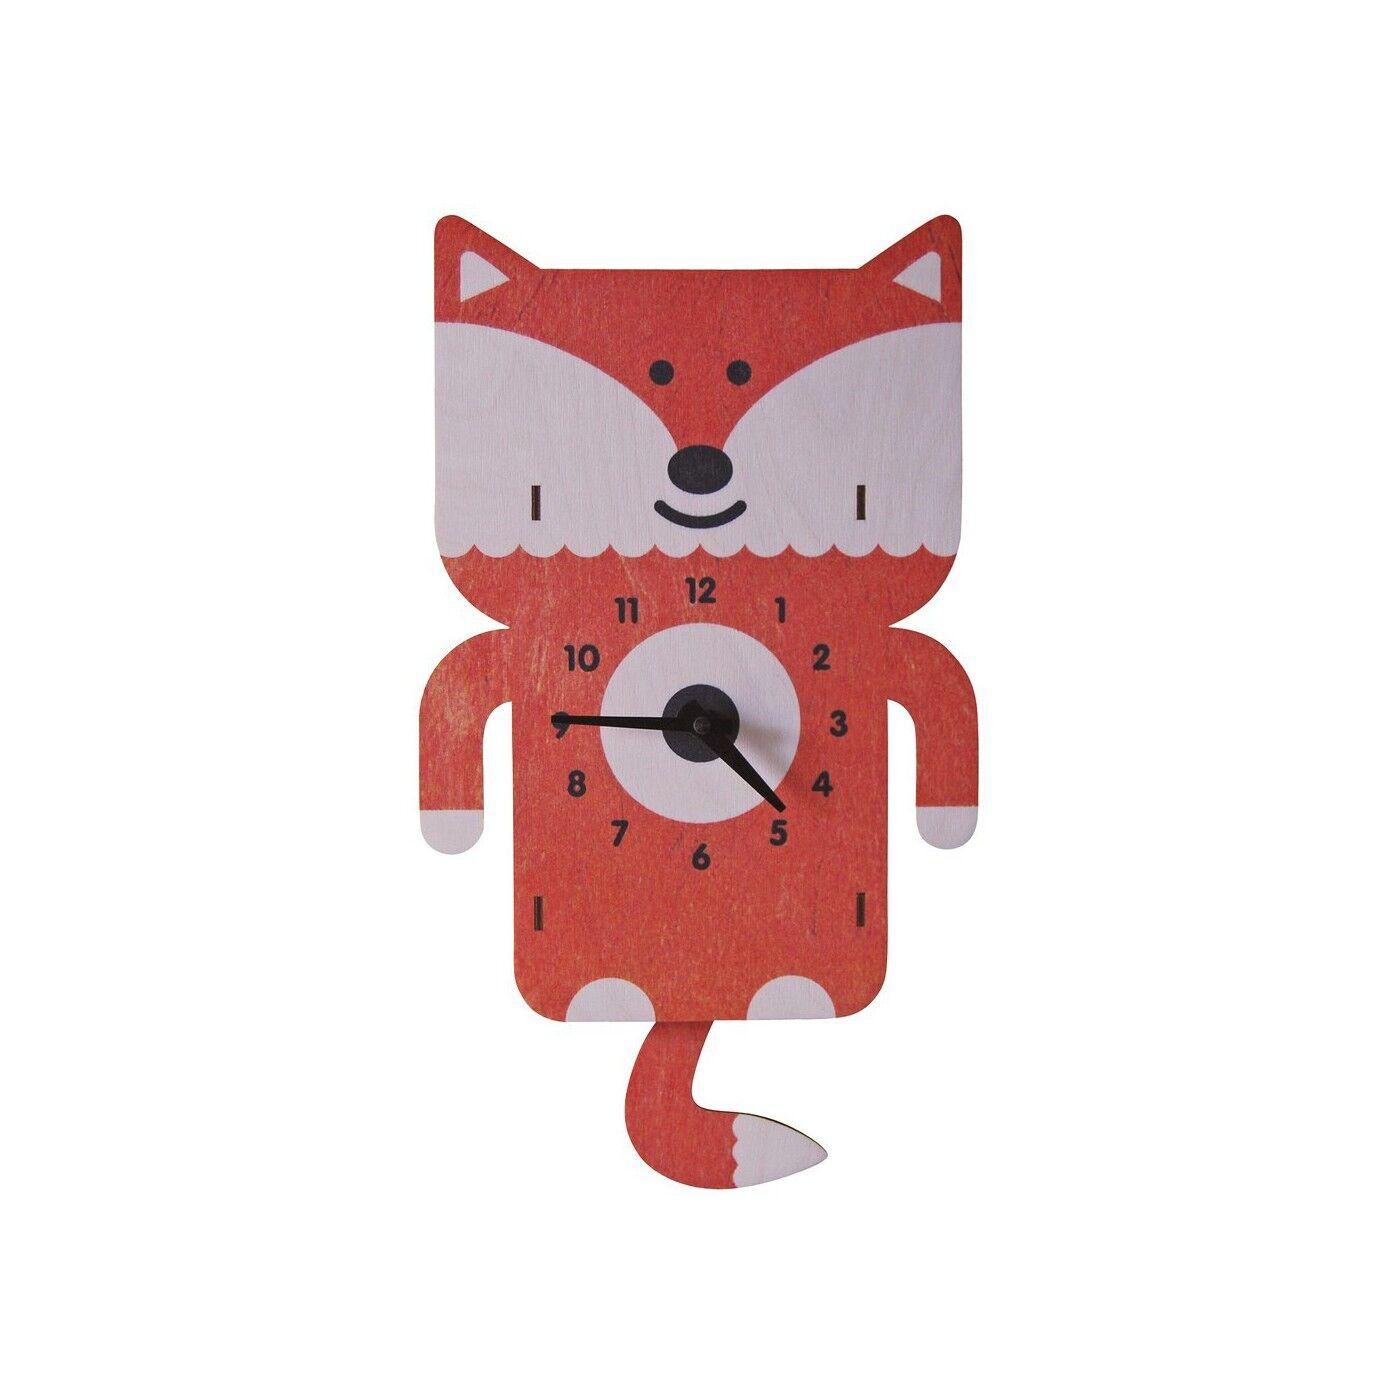 Modern Moose Horloge Murale à Balancier Fox pour Enfants Modern Moose